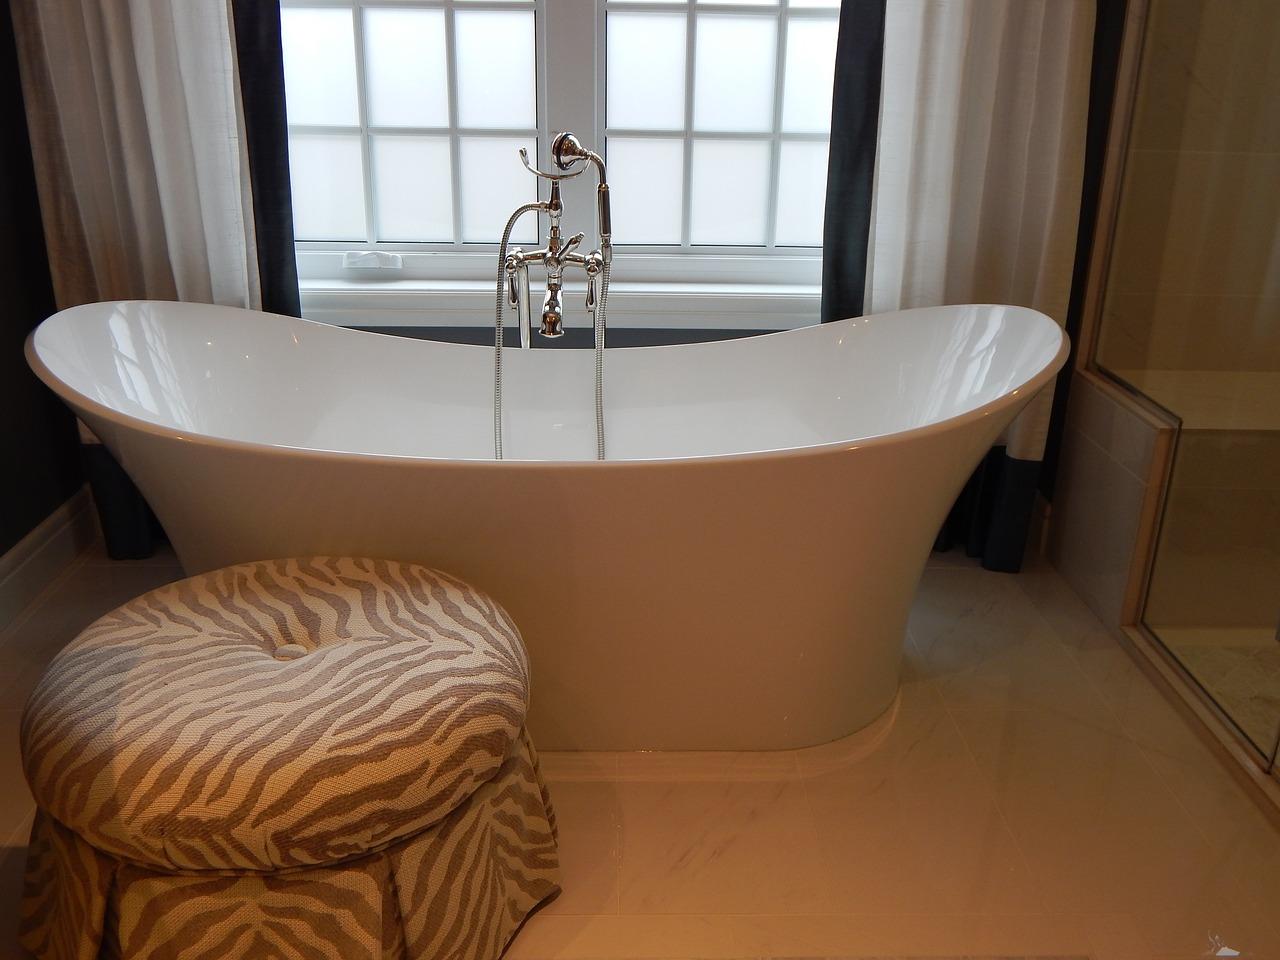 salle de bain romantique salle de bain r tro inspirations. Black Bedroom Furniture Sets. Home Design Ideas